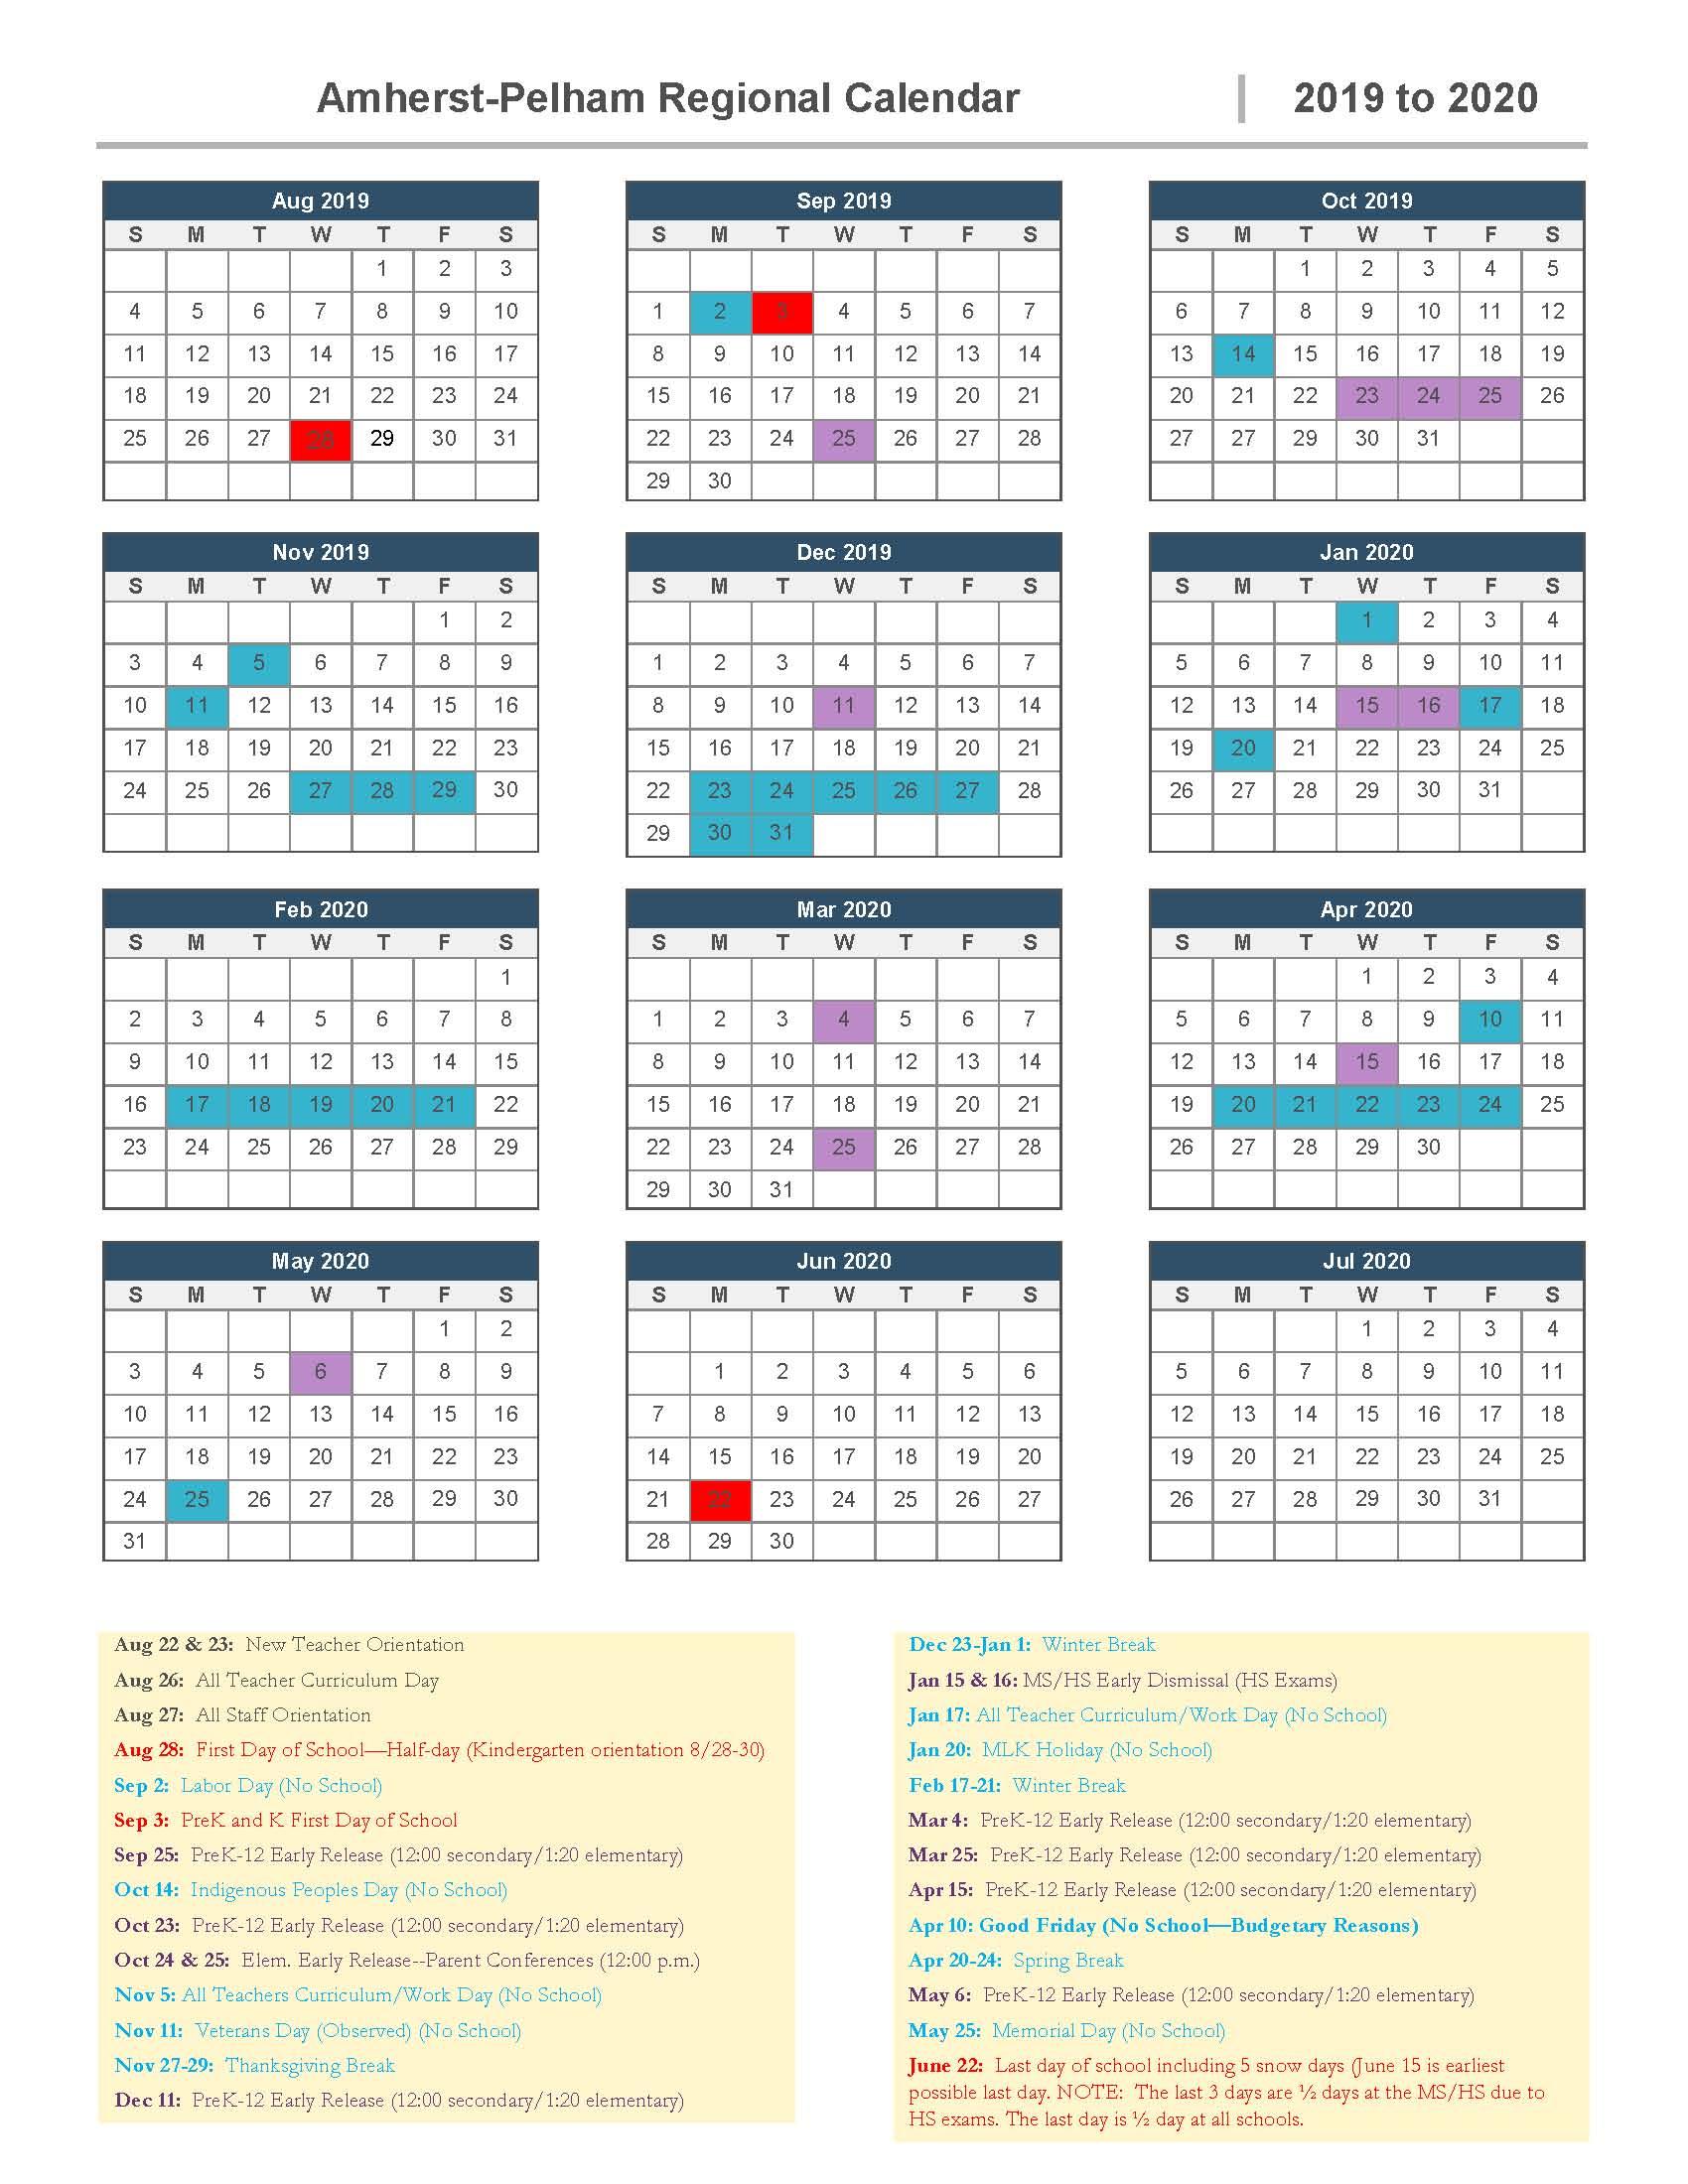 2019-2020 School Calendar Approved   Amherst-Pelham Regional